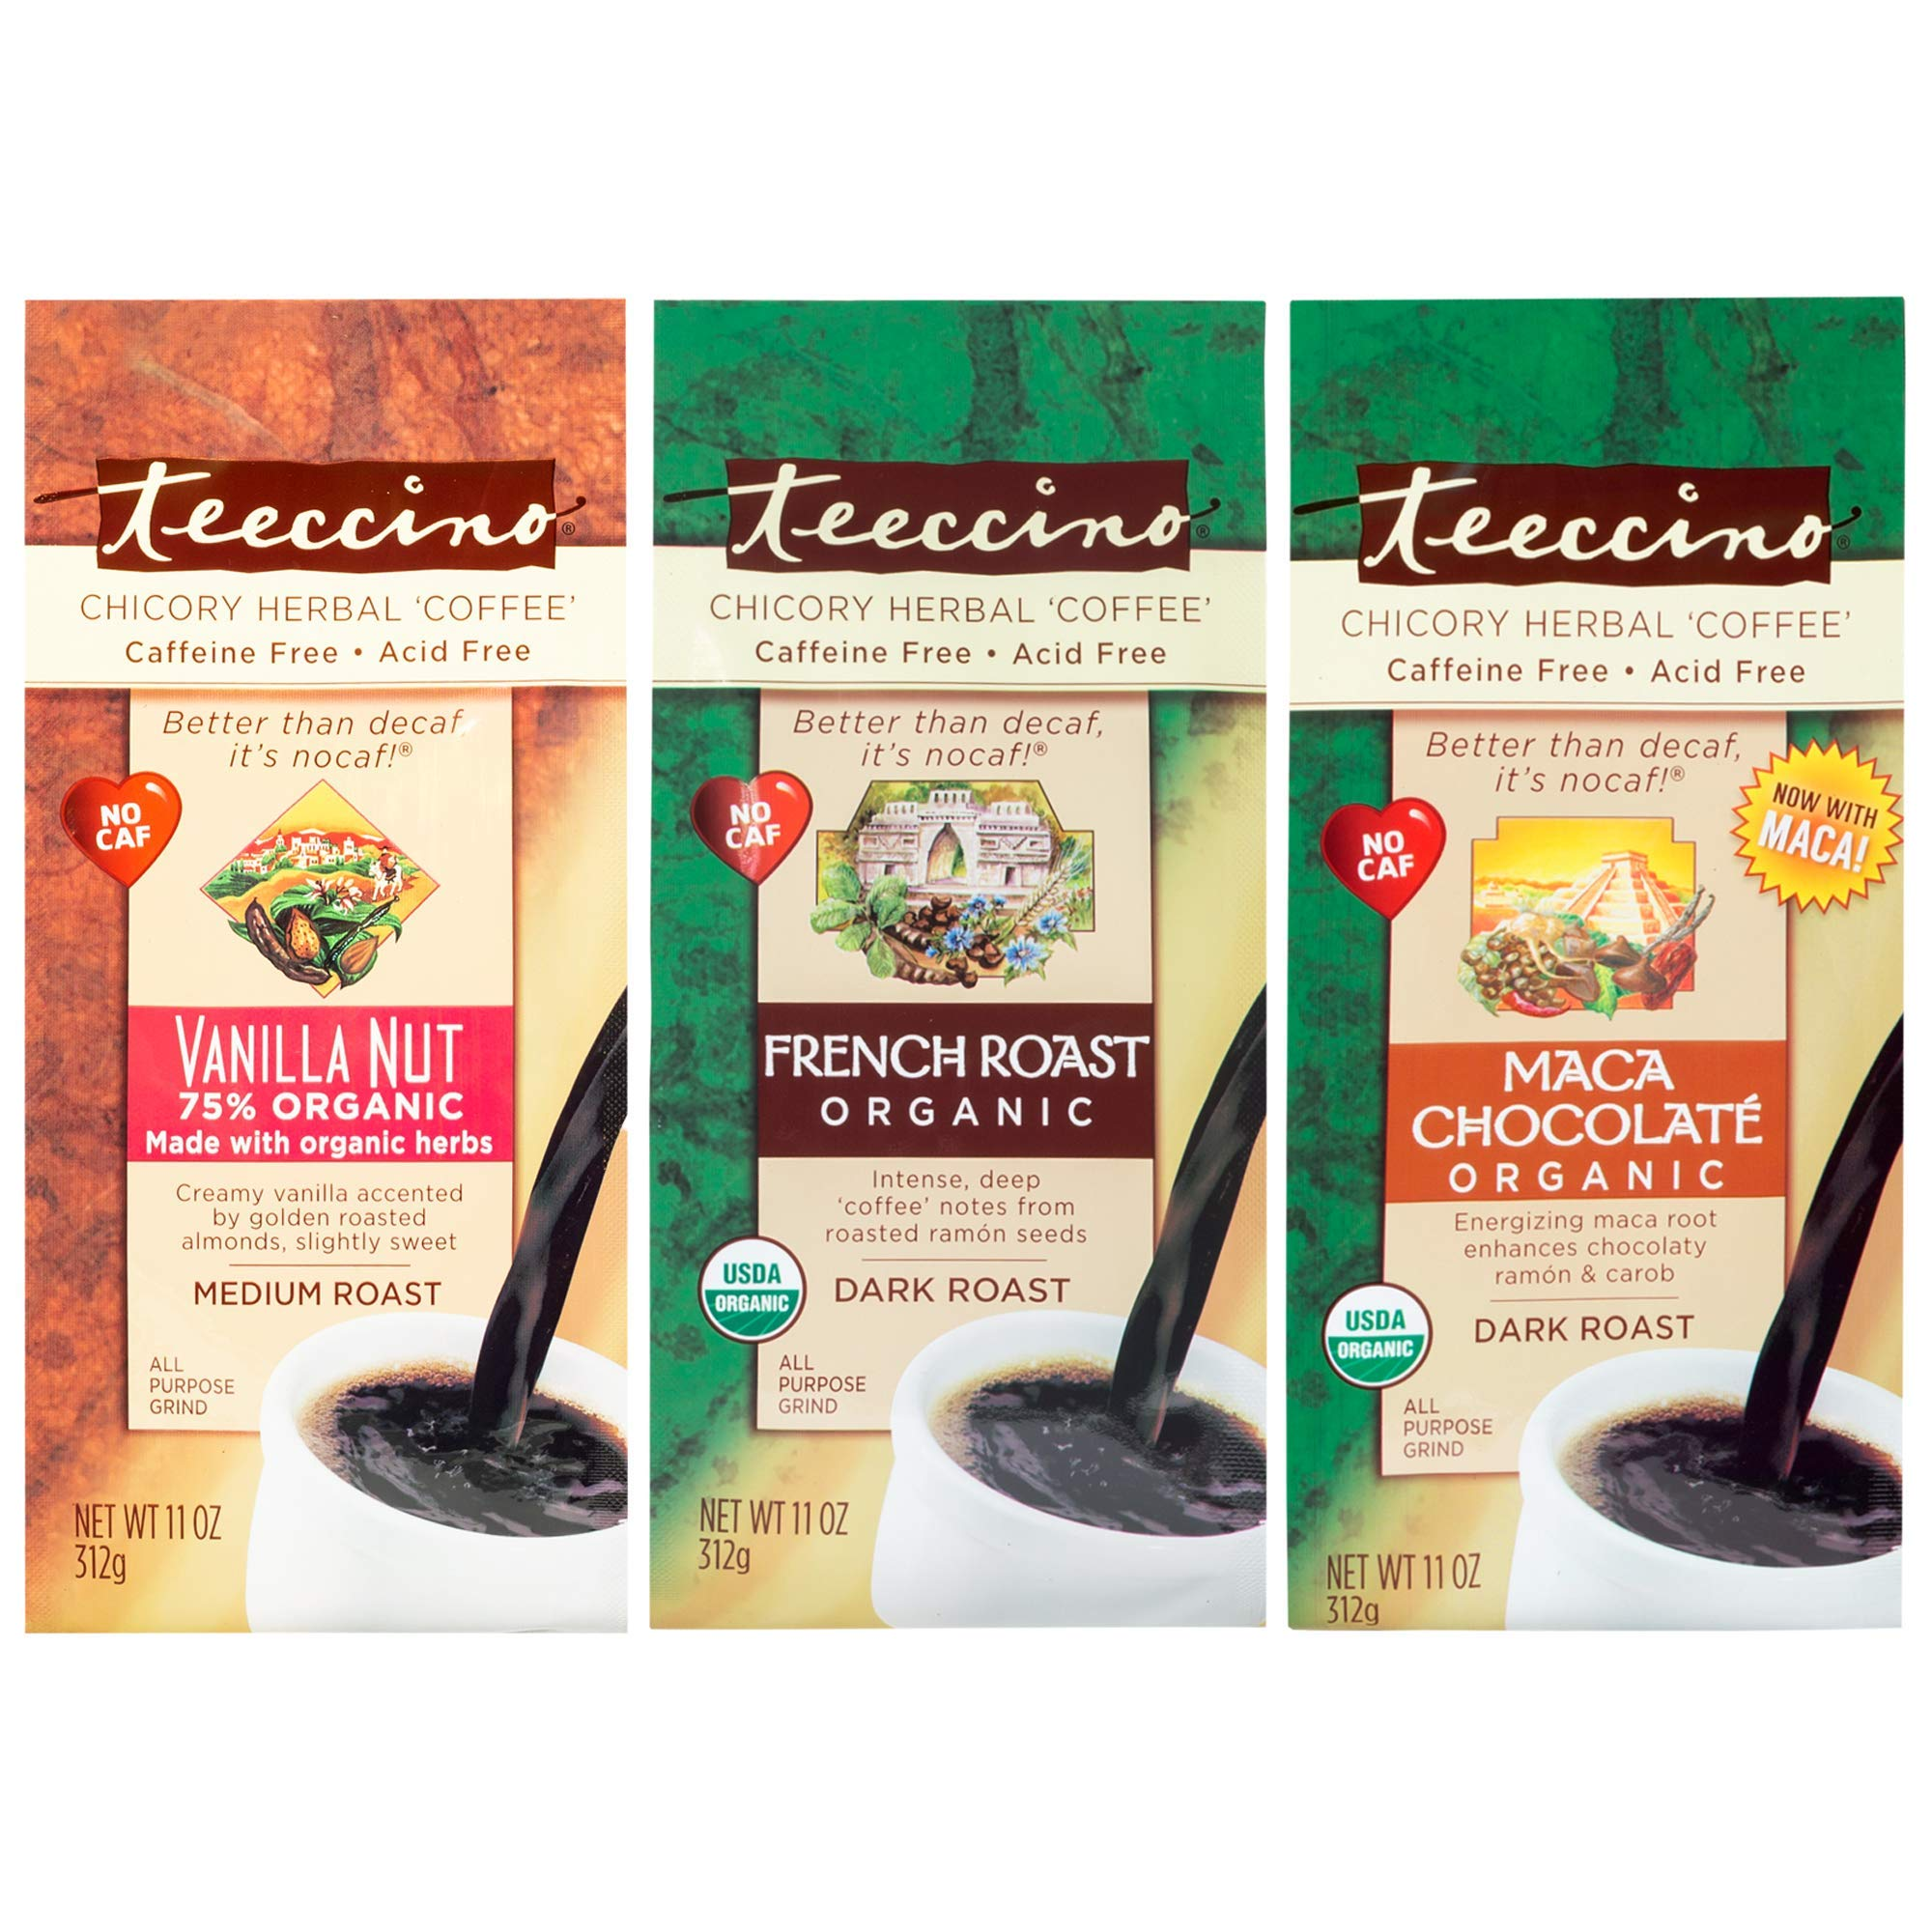 Teeccino Chicory Herbal Coffee Variety Pack (Vanilla Nut, French Roast, Maca Chocolaté), Caffeine Free, Acid Free, Coffee Alternative, Prebiotic, 11 Ounce (Pack of 3)